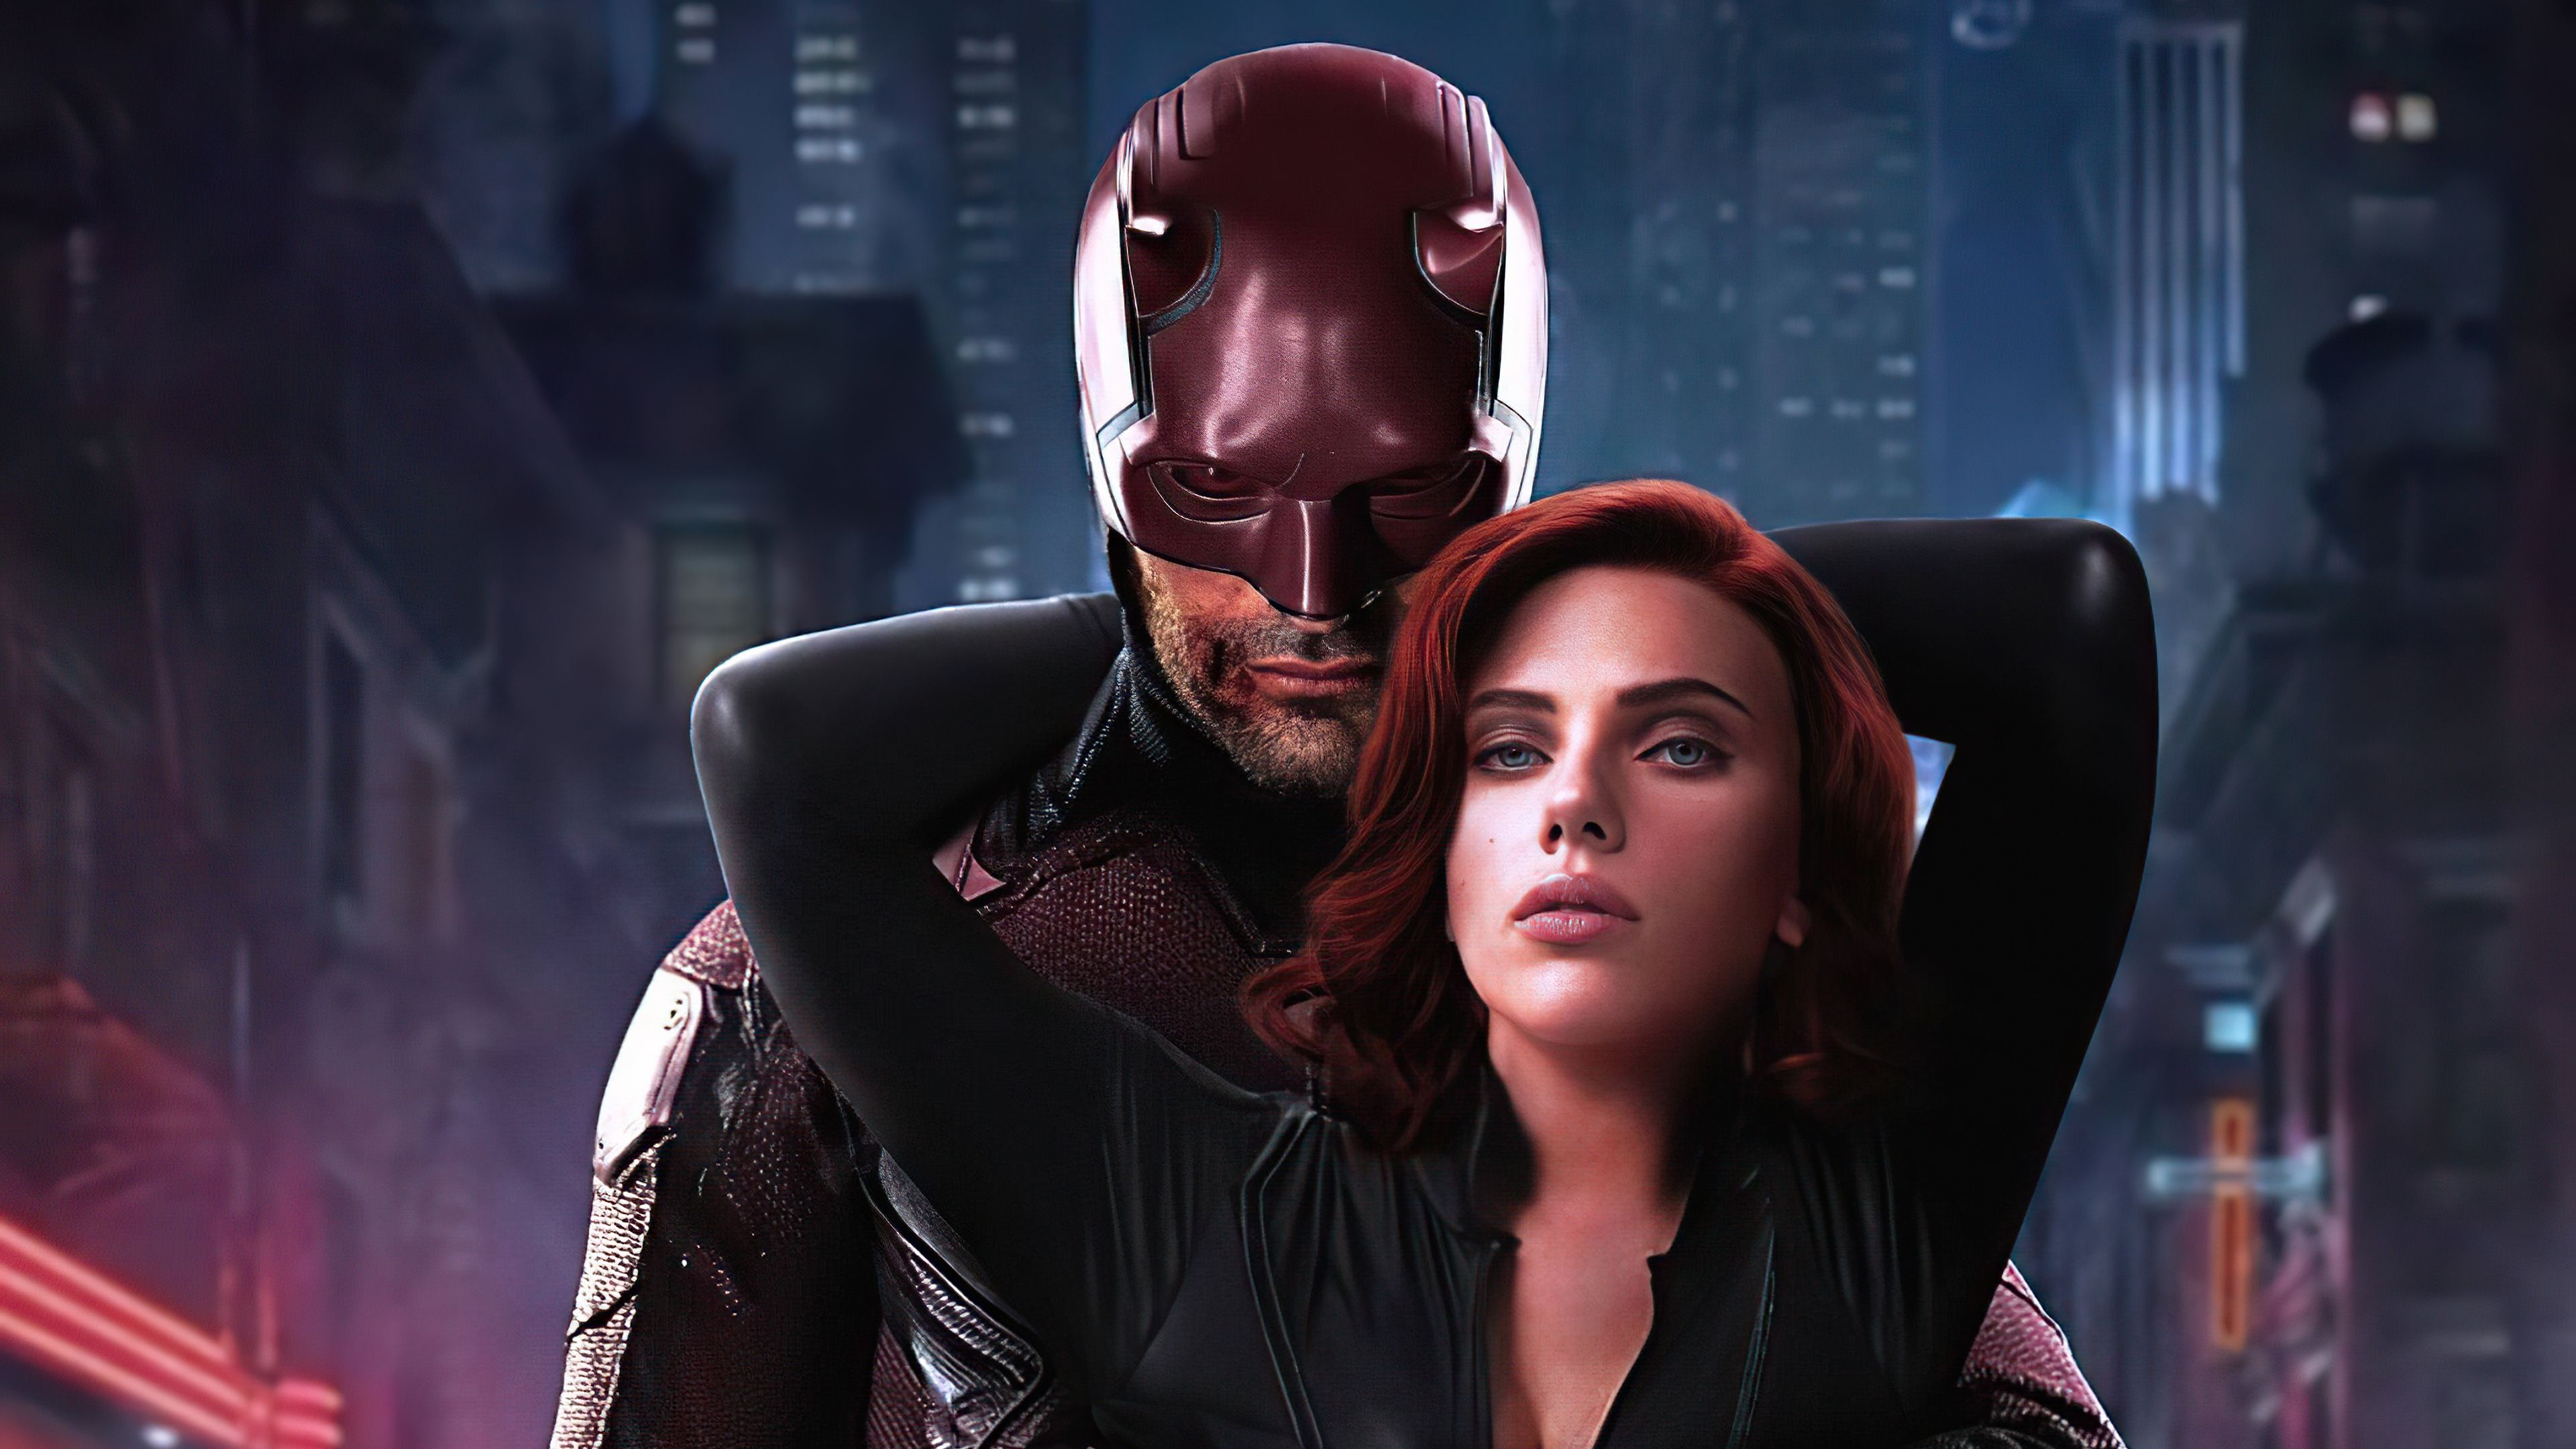 daredevil and black widow 4k 1619216467 - Daredevil And Black Widow 4k - Daredevil And Black Widow 4k wallpapers